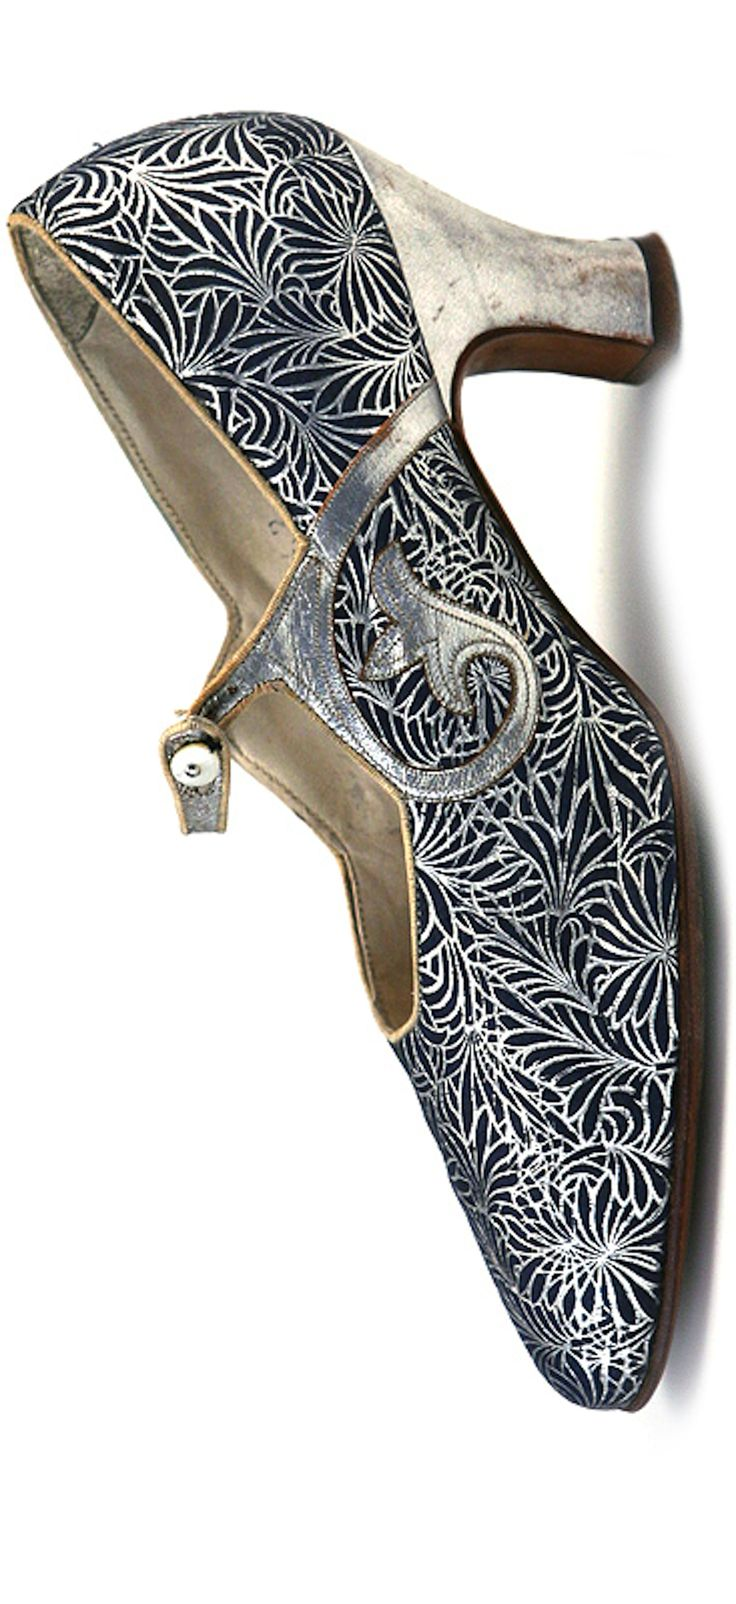 Vintage shoes - Art Deco Pair of Blue & Silver Metallic Leather Shoes - 1920s - U.S.A.